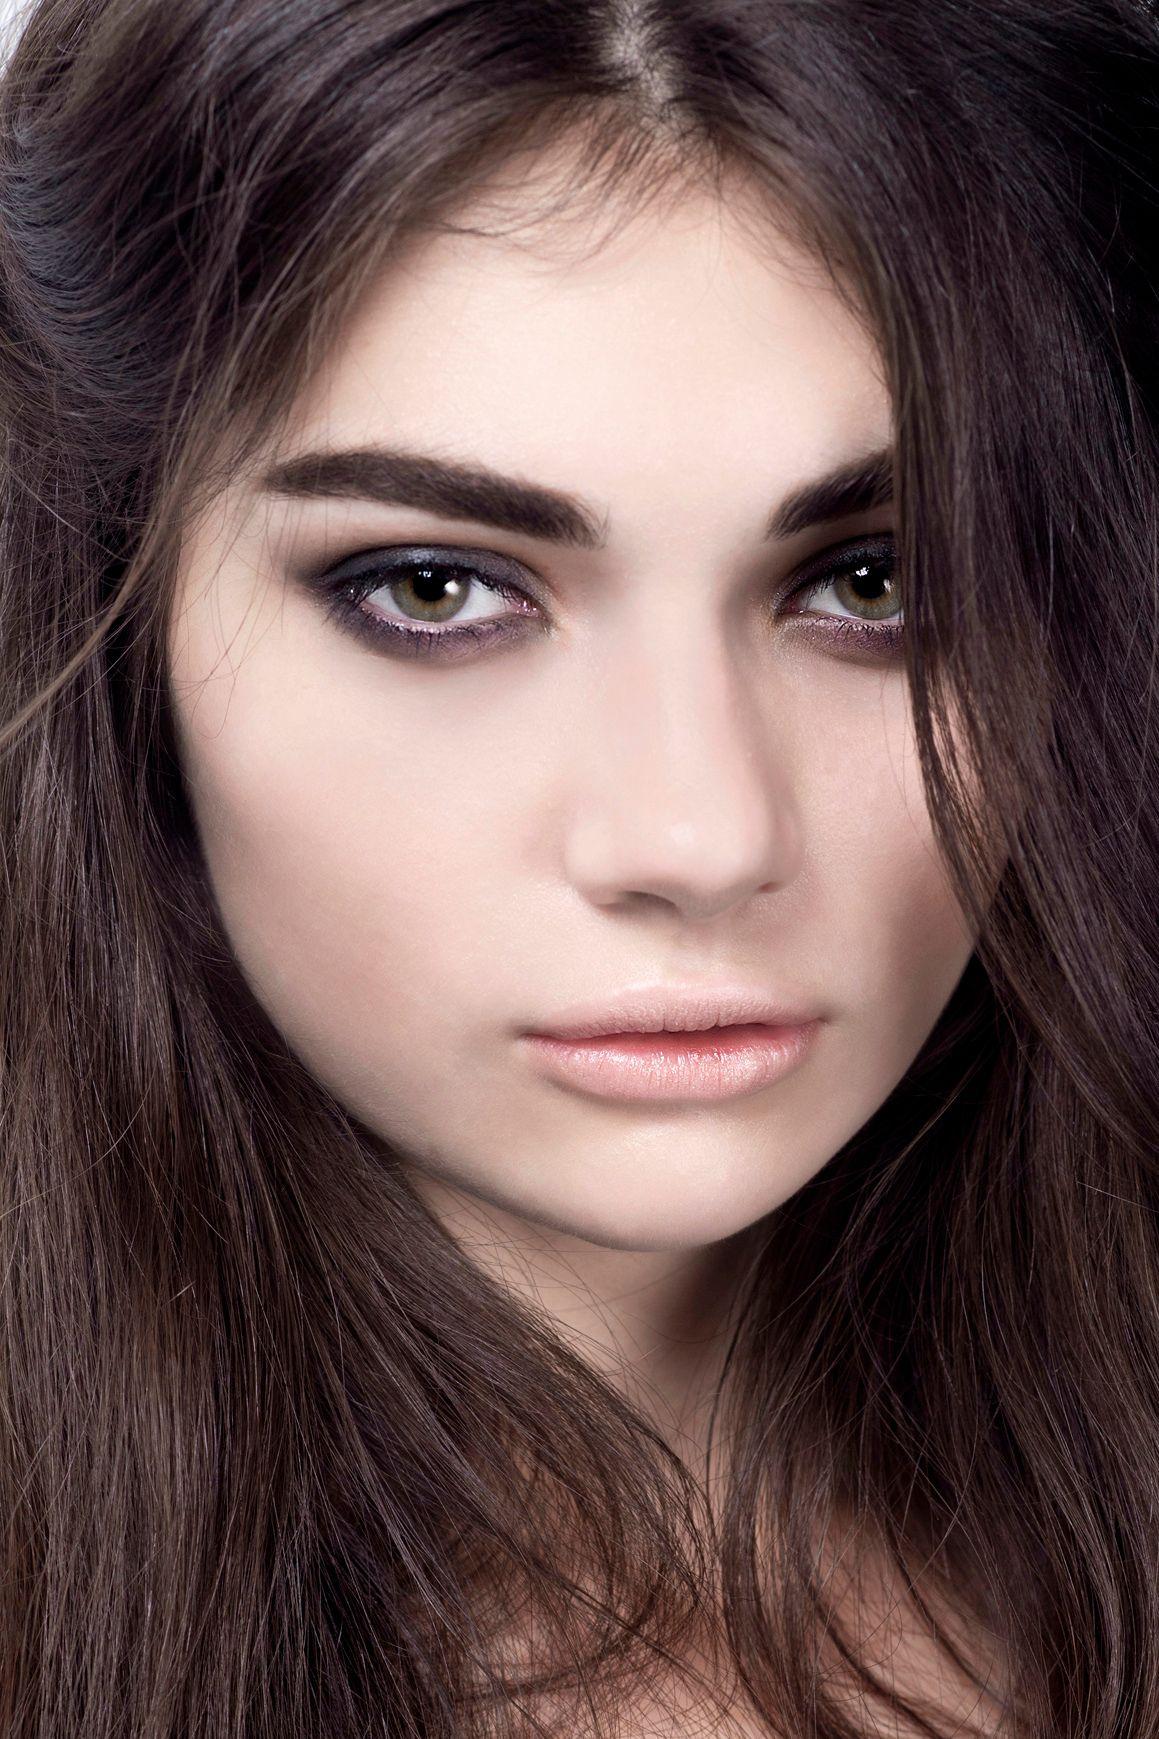 Eye Makeup for Fall - Perfect Fall Eye Shadow Looks You